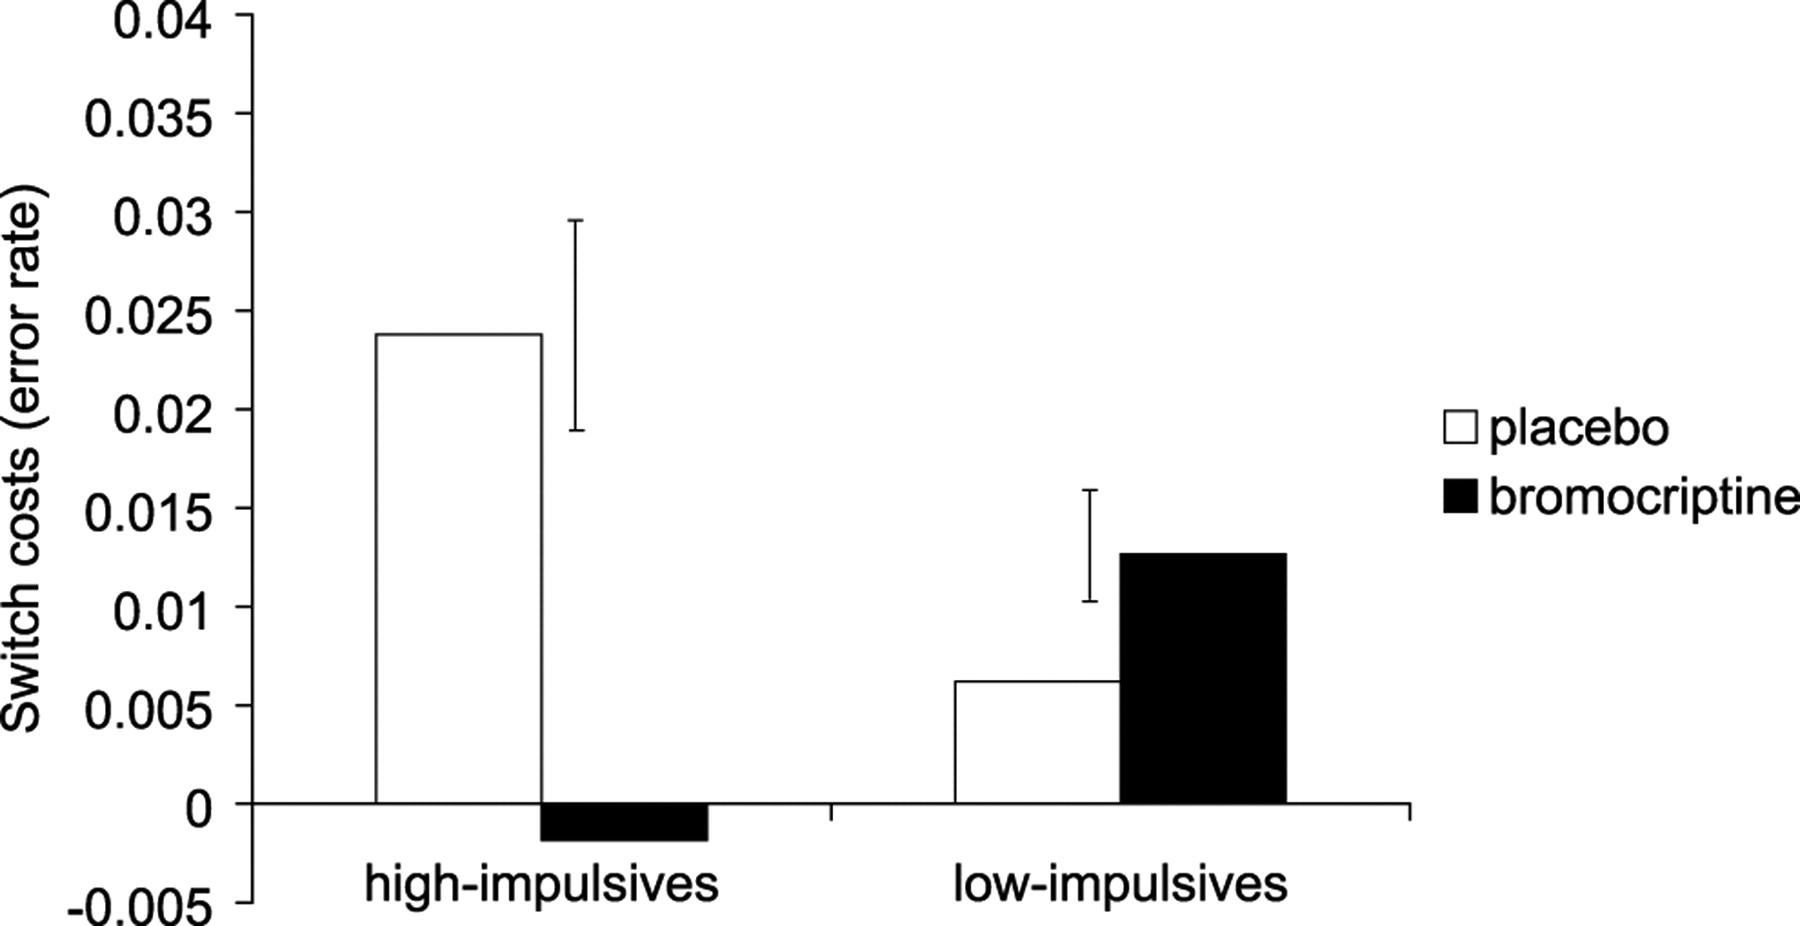 impulsive personality predicts dopamine